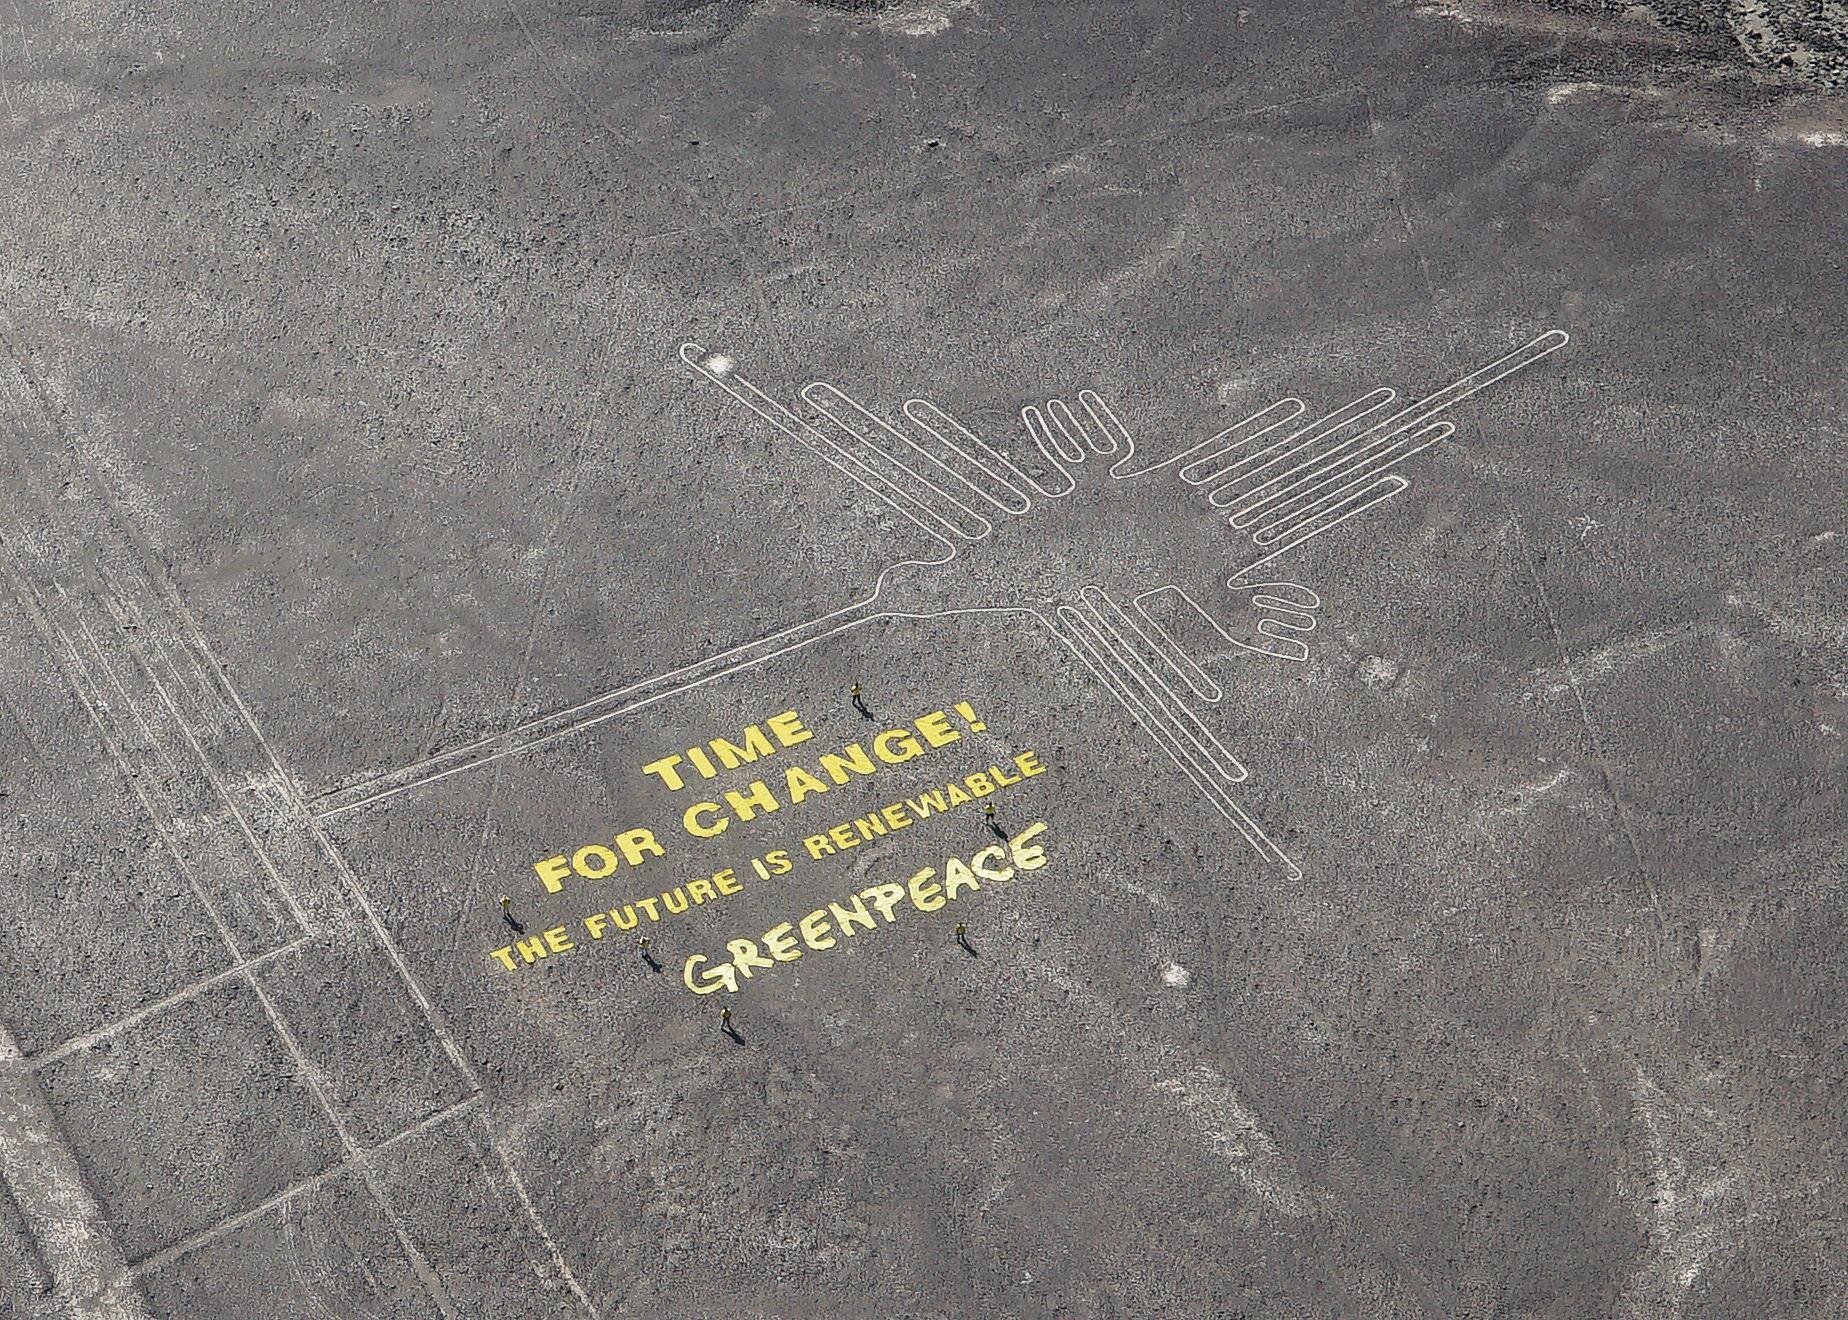 greenpeace-peru-linee-nazca